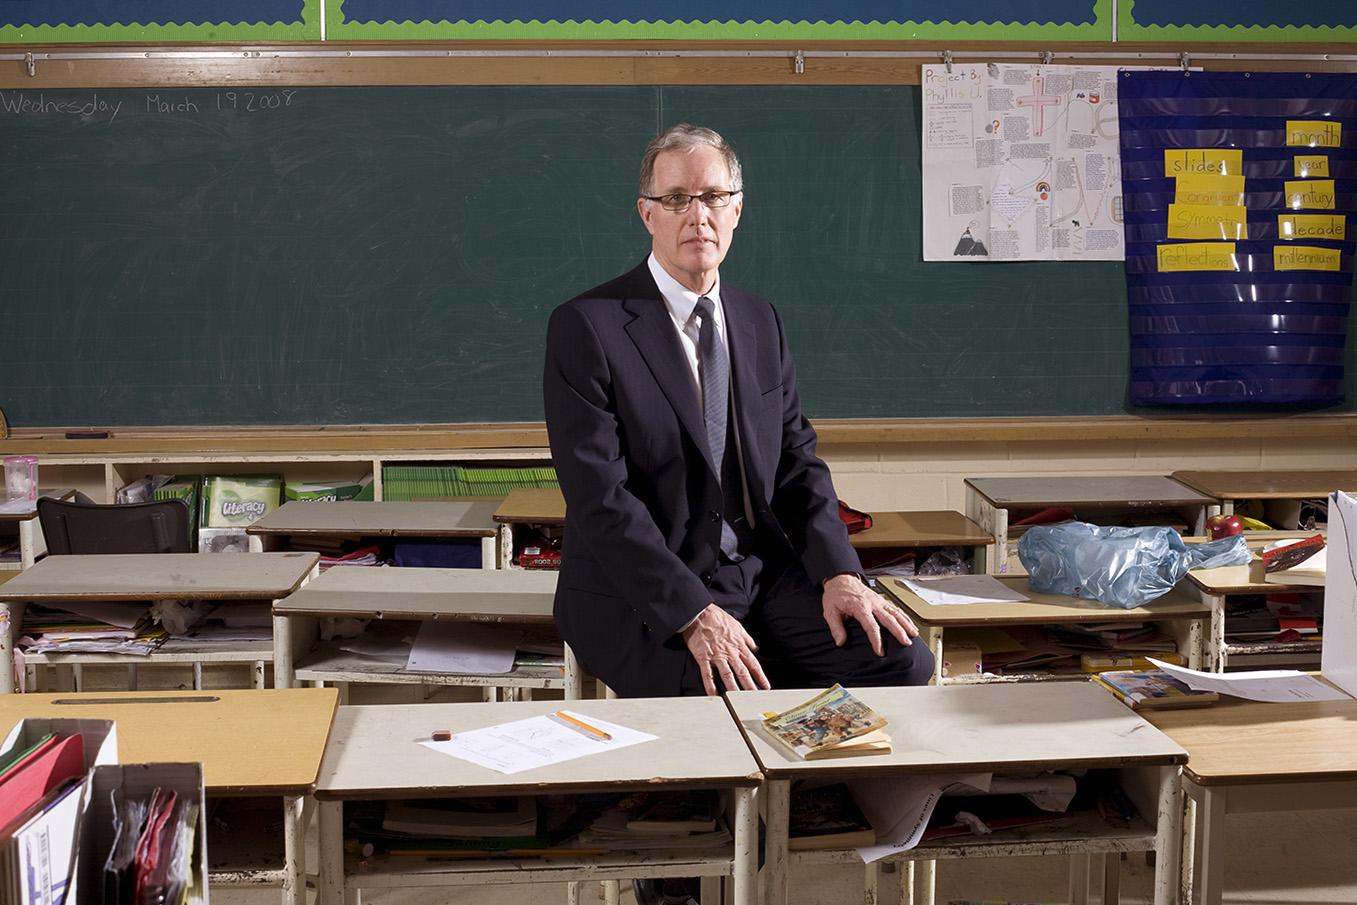 Portrait of Jim Leech, former head of OTPP